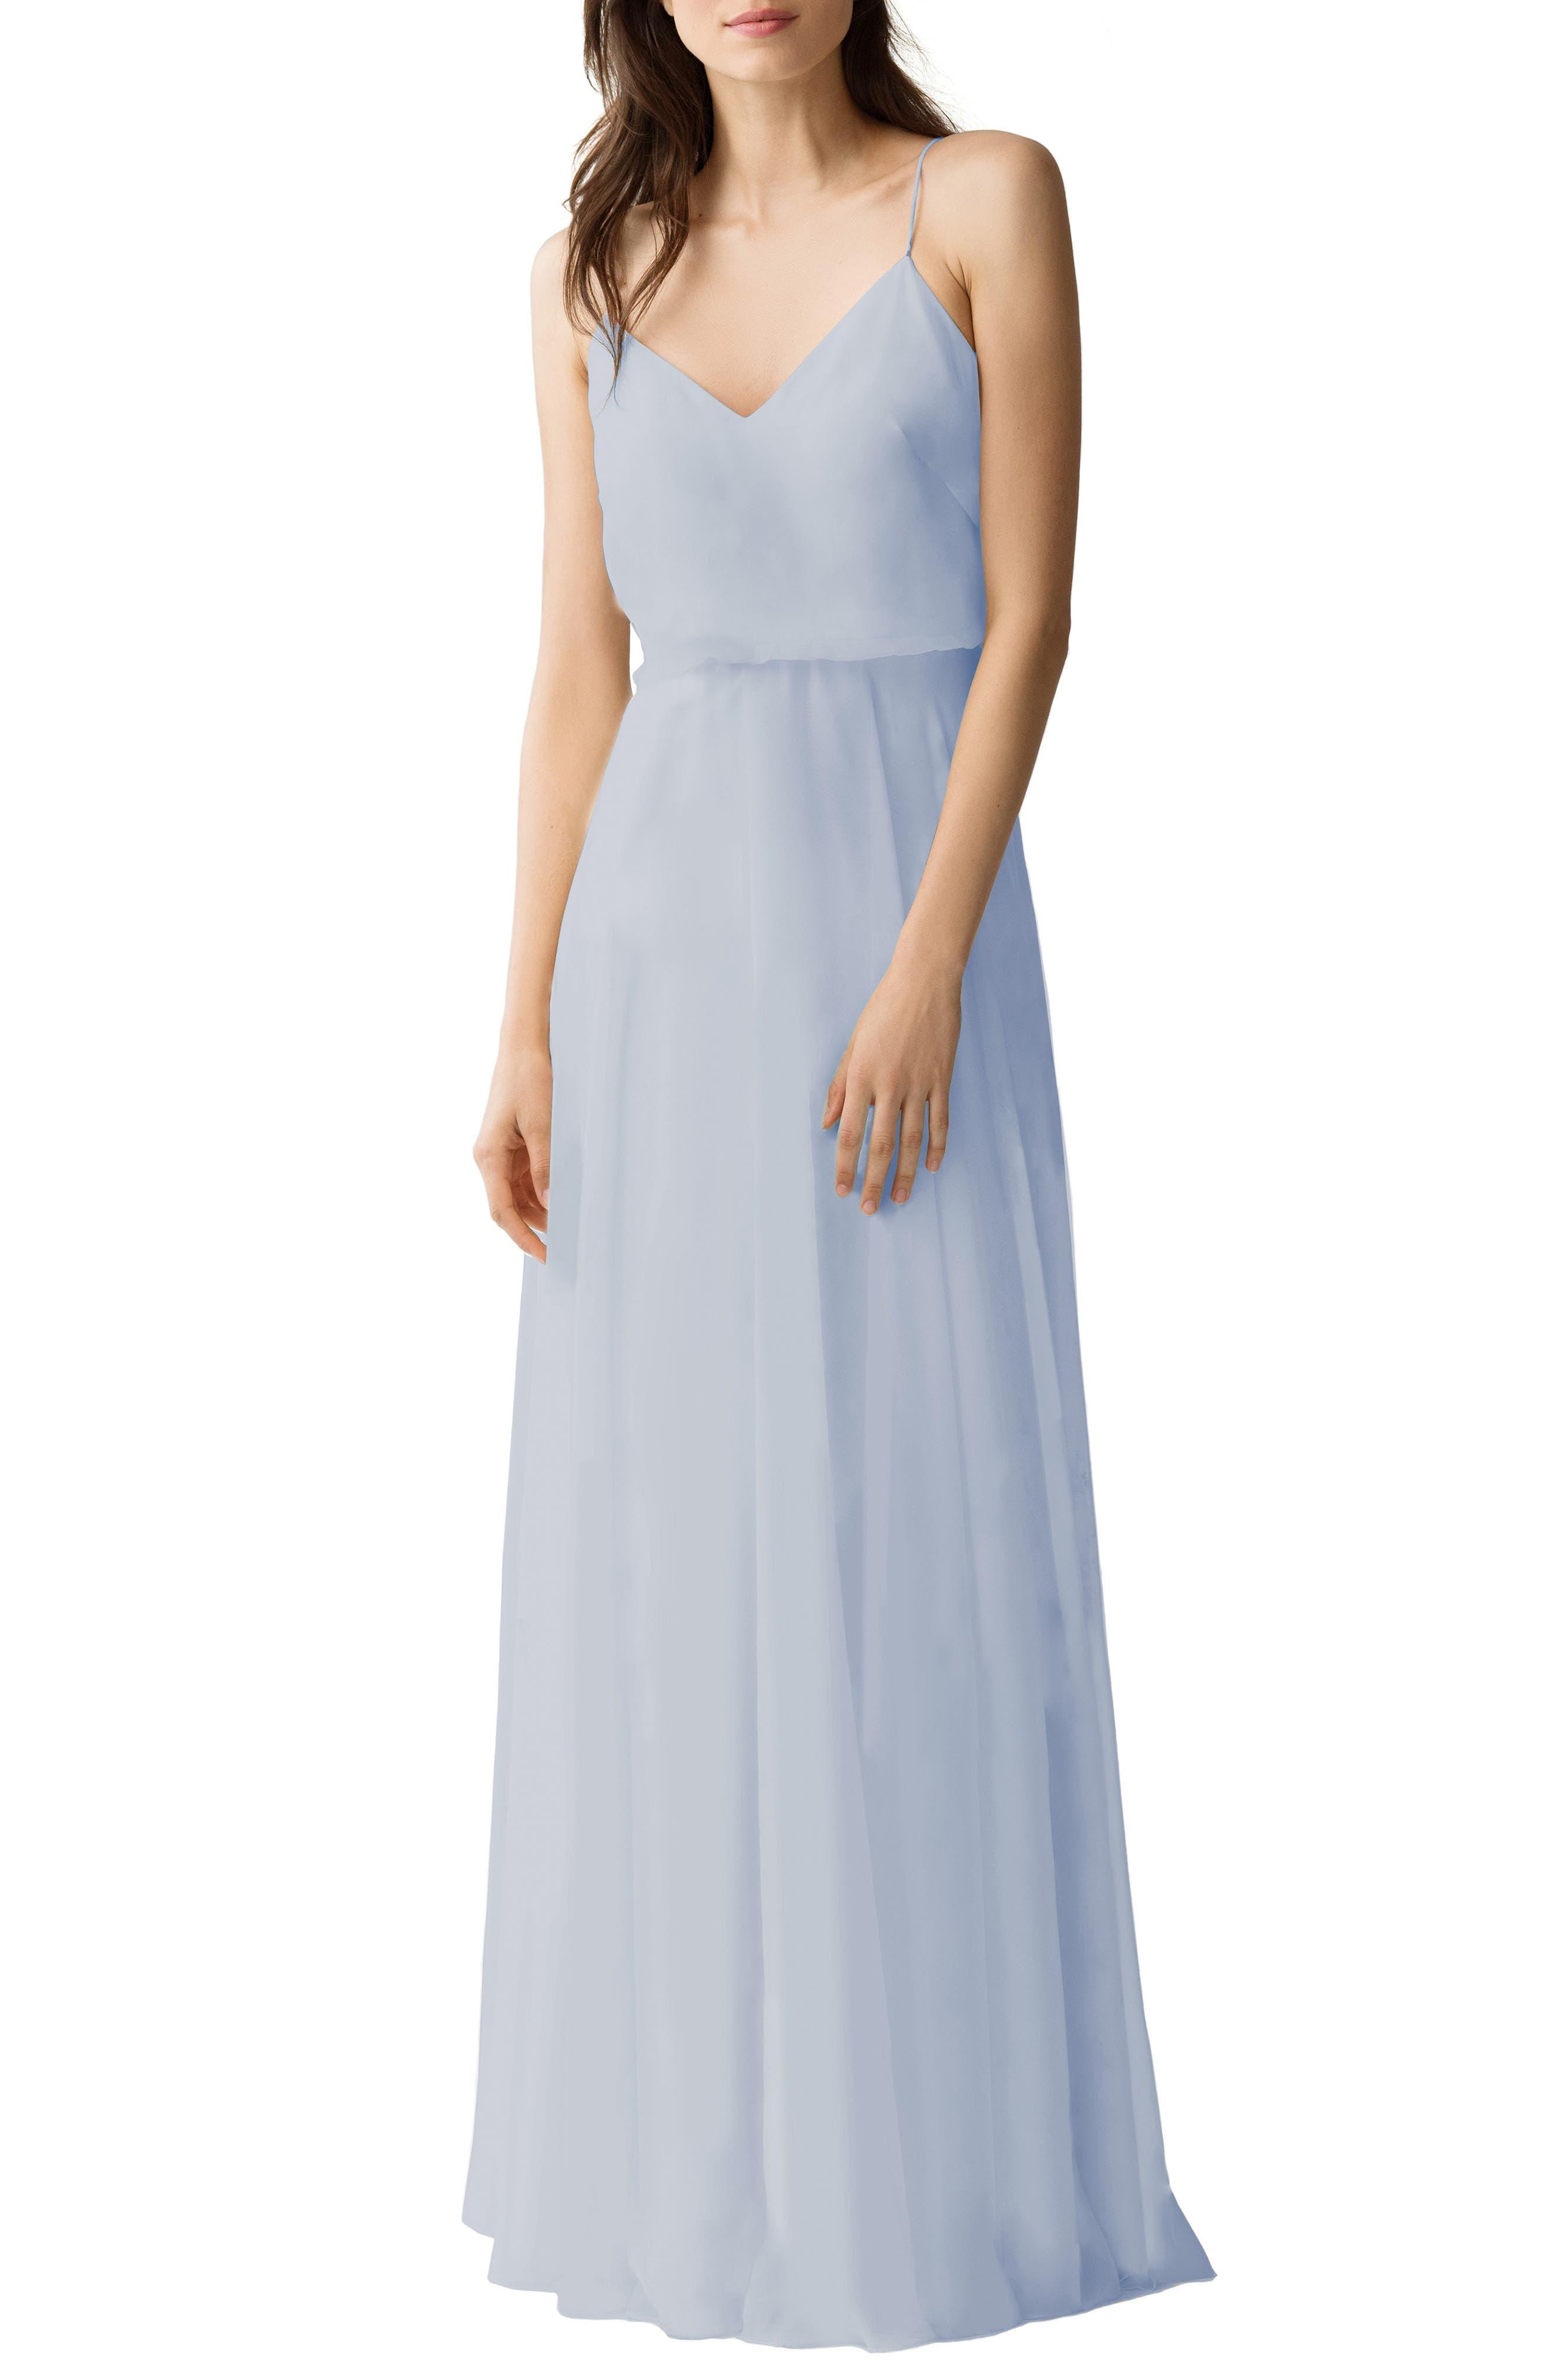 Inesse Chiffon V-Neck Spaghetti Strap Gown,                             Main thumbnail 1, color,                             Whisper Blue